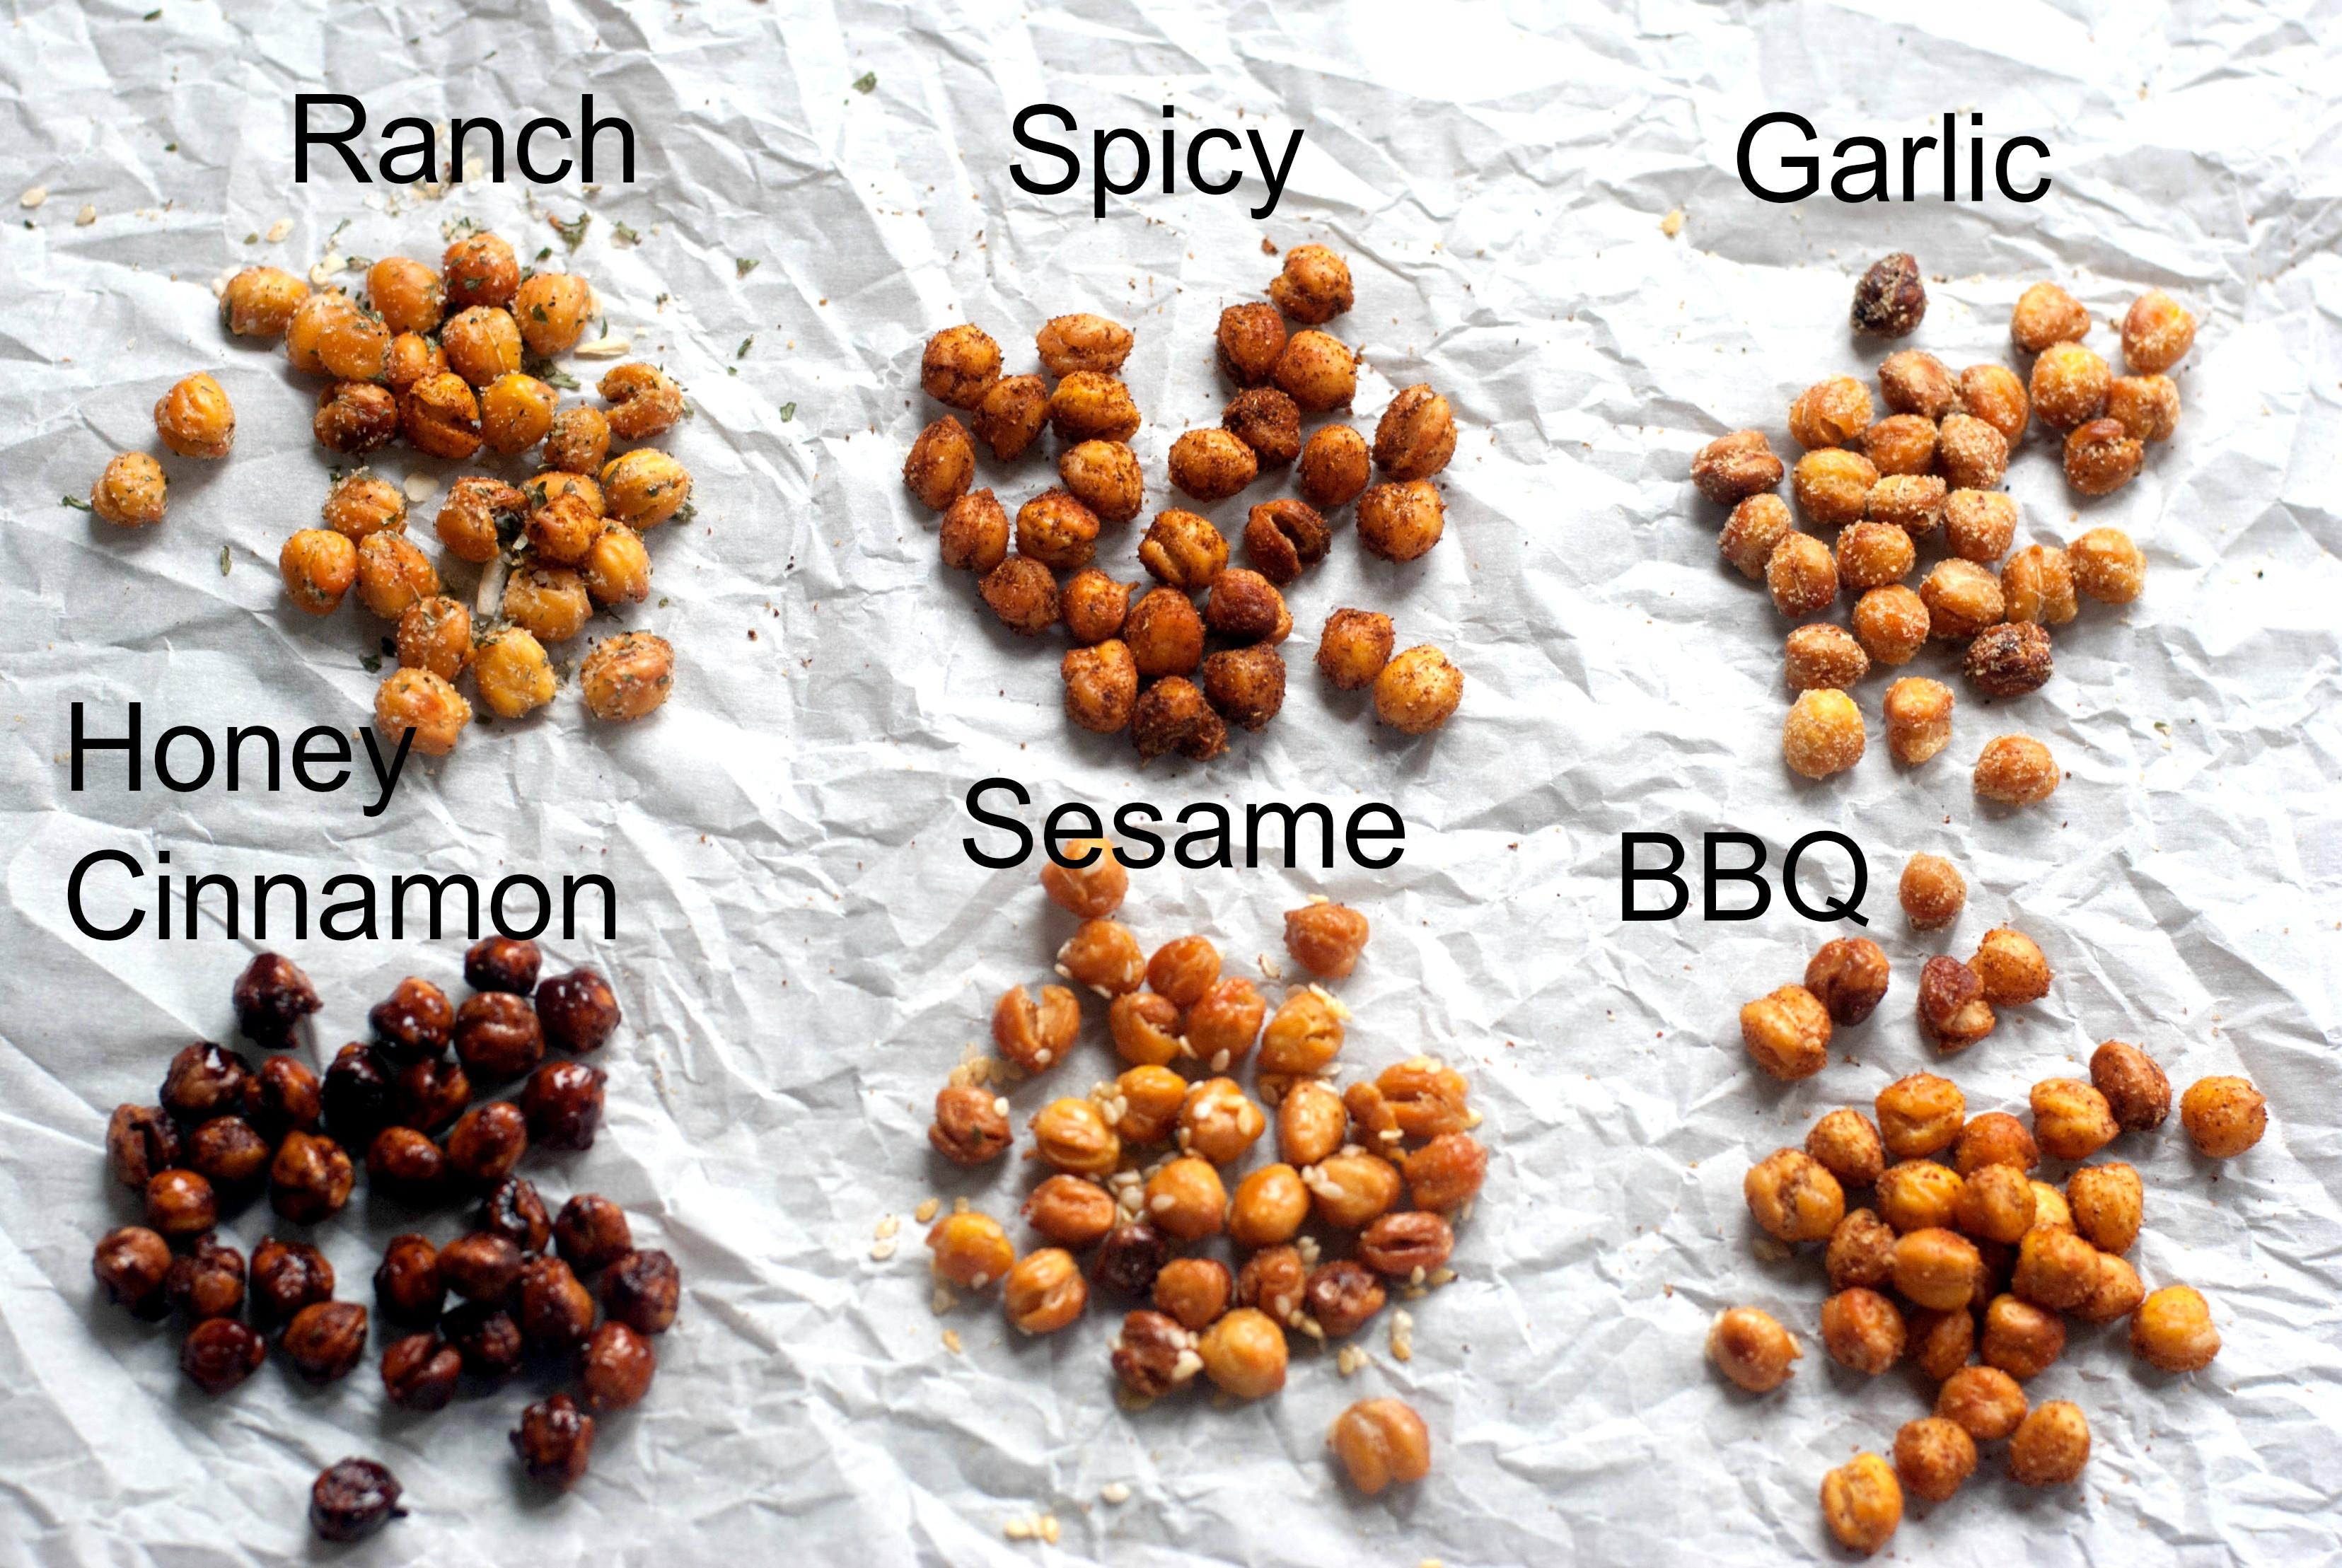 Chickpea Snacks Recipes  Roasted Chickpeas Recipe TGIF This Grandma is Fun